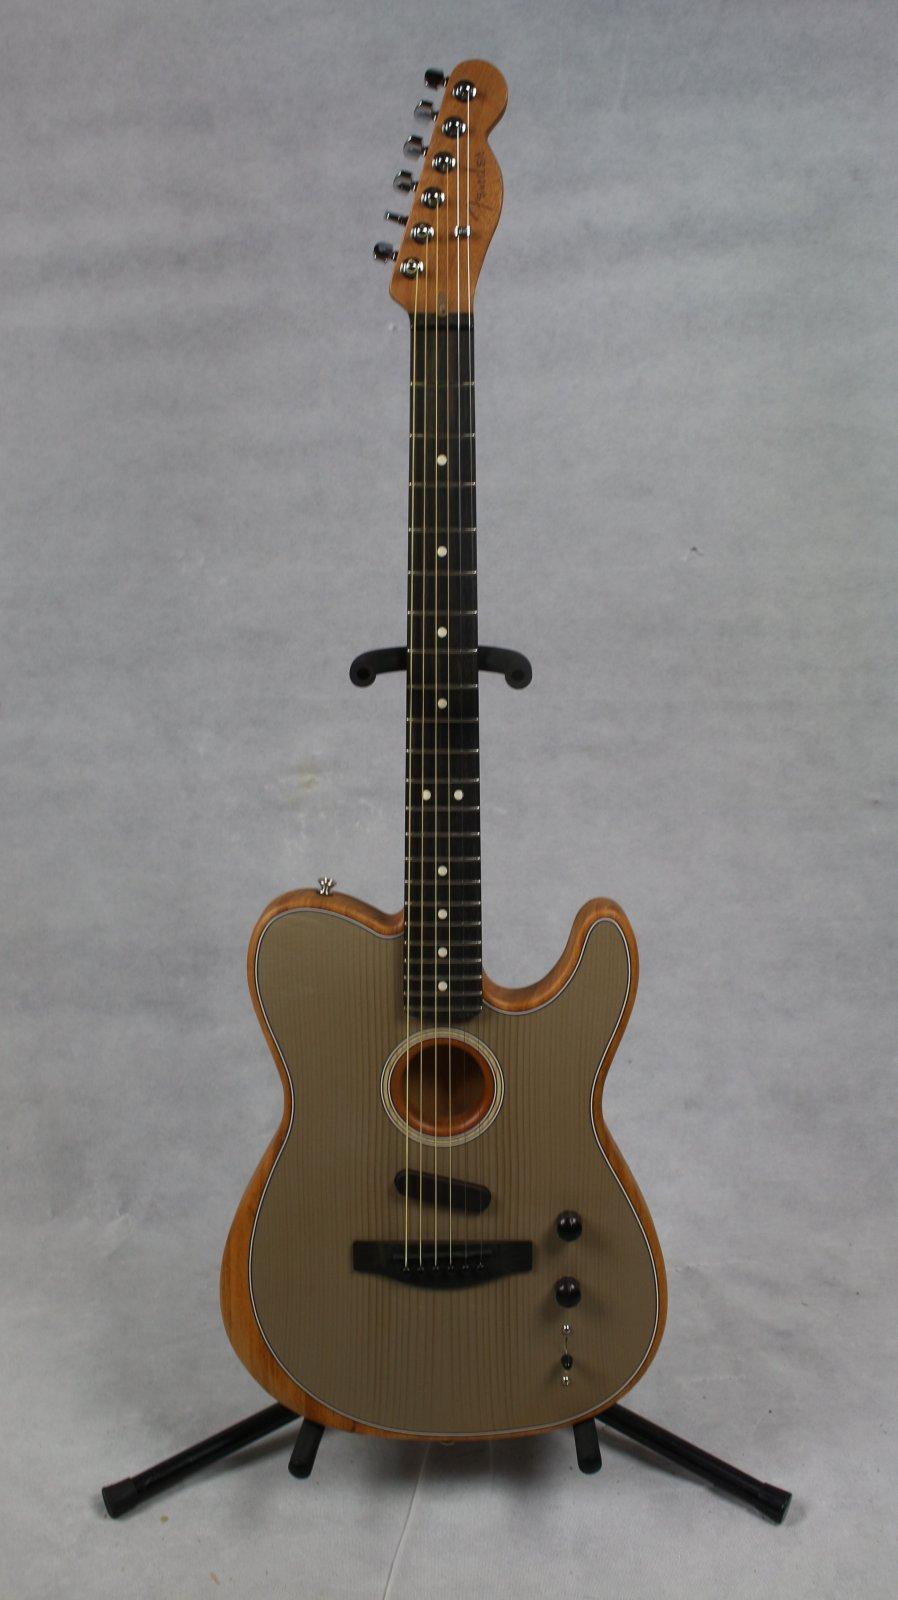 Fender American Acoustasonic Telecaster Ebony Fingerboard Sonic Gray